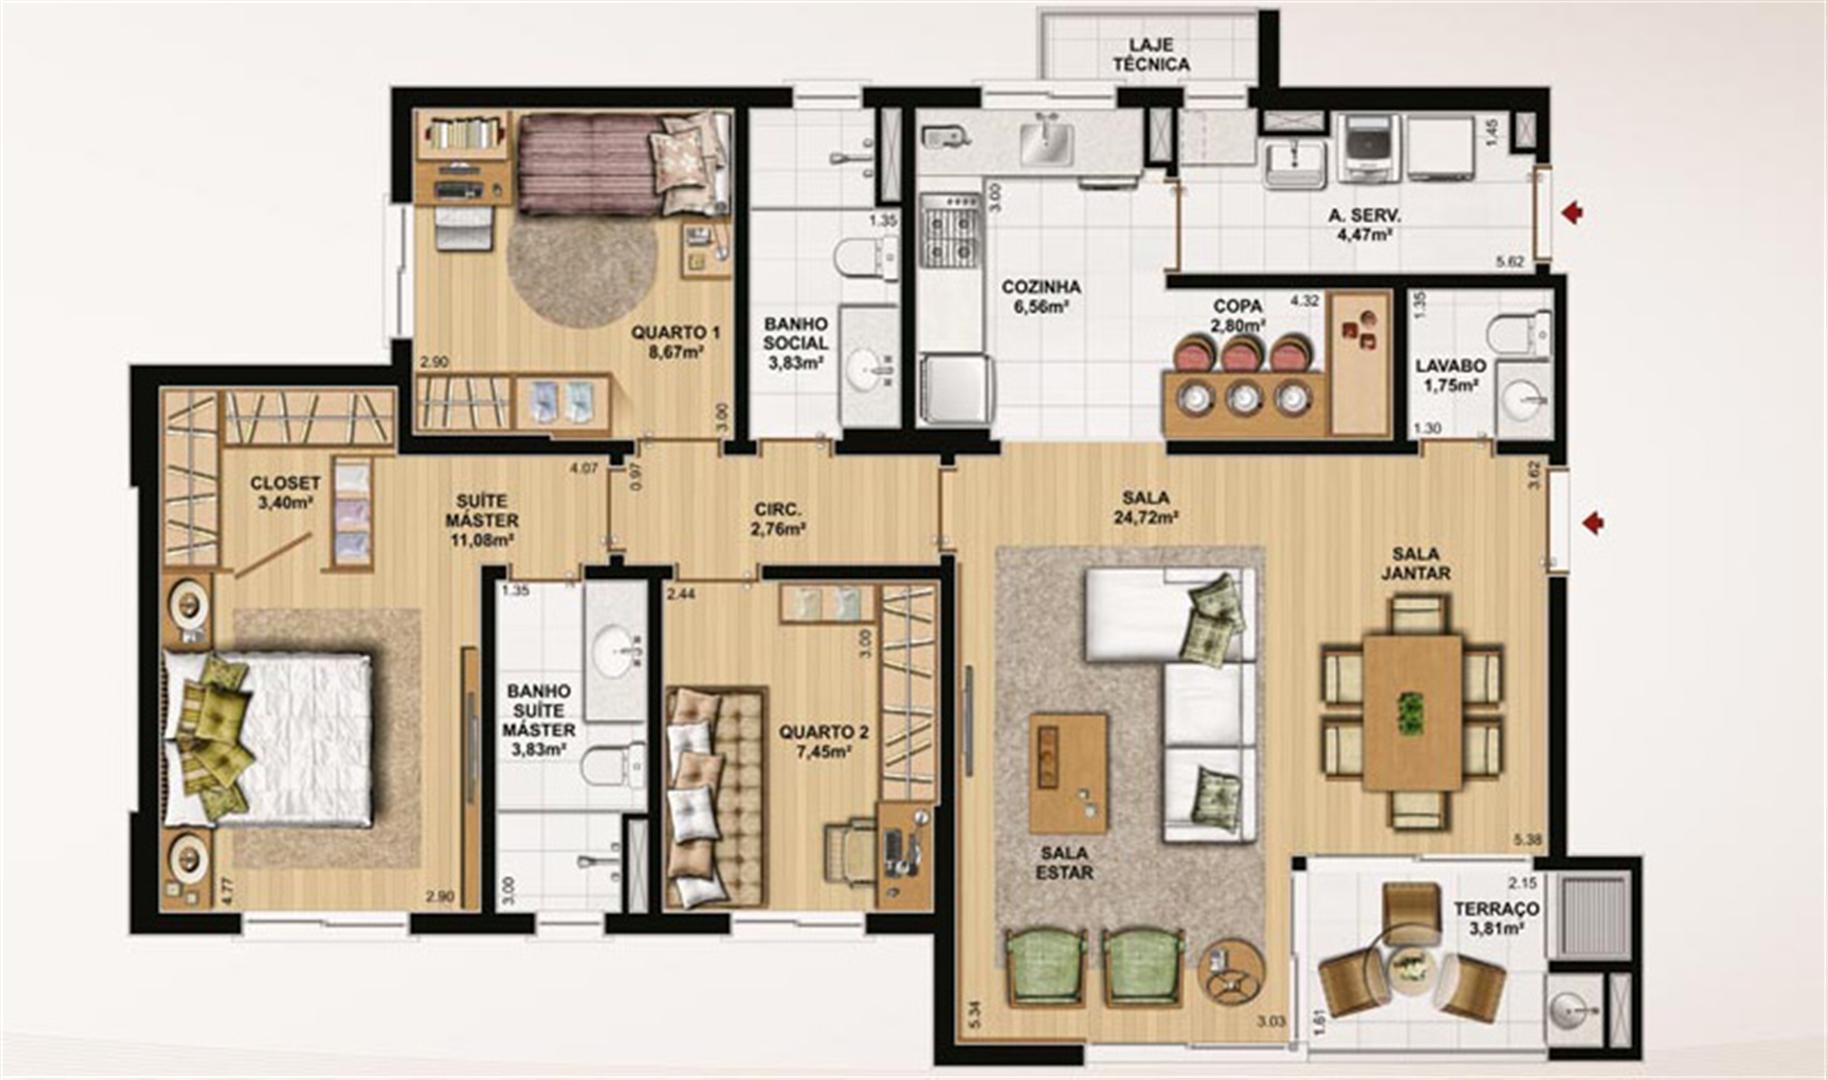 106 m² privativos, 3 dormitórios, lavabo e copa | Le Jardin Residencial – Apartamento no  Água Verde - Curitiba - Paraná